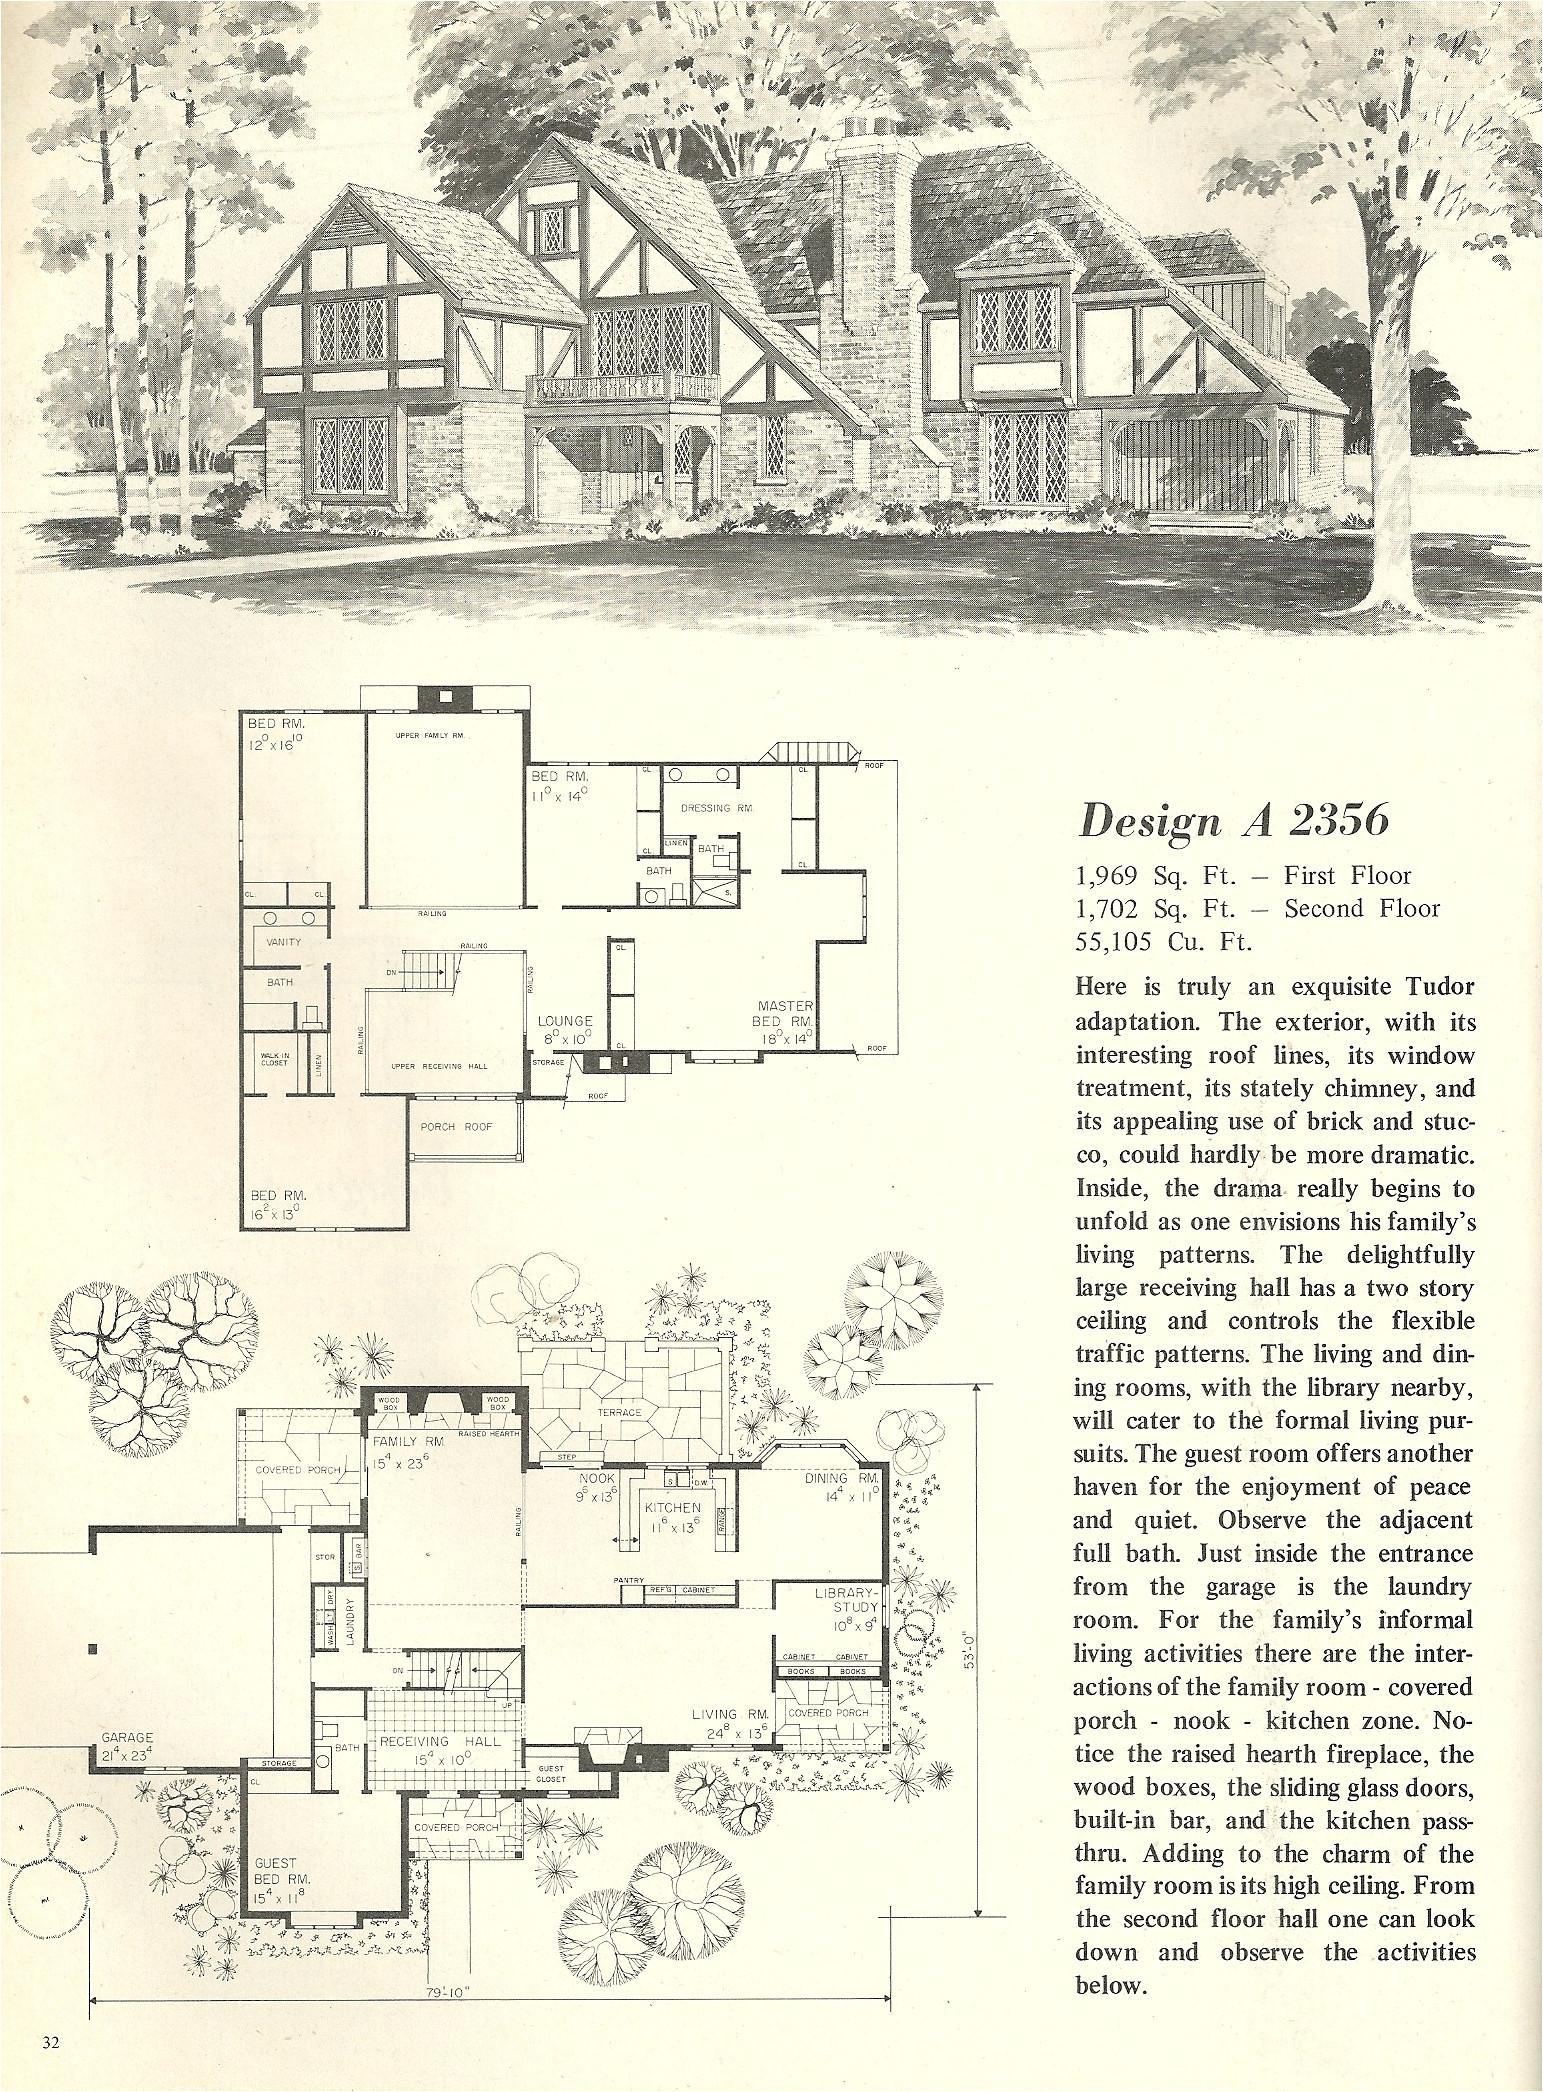 vintage house plans 2356